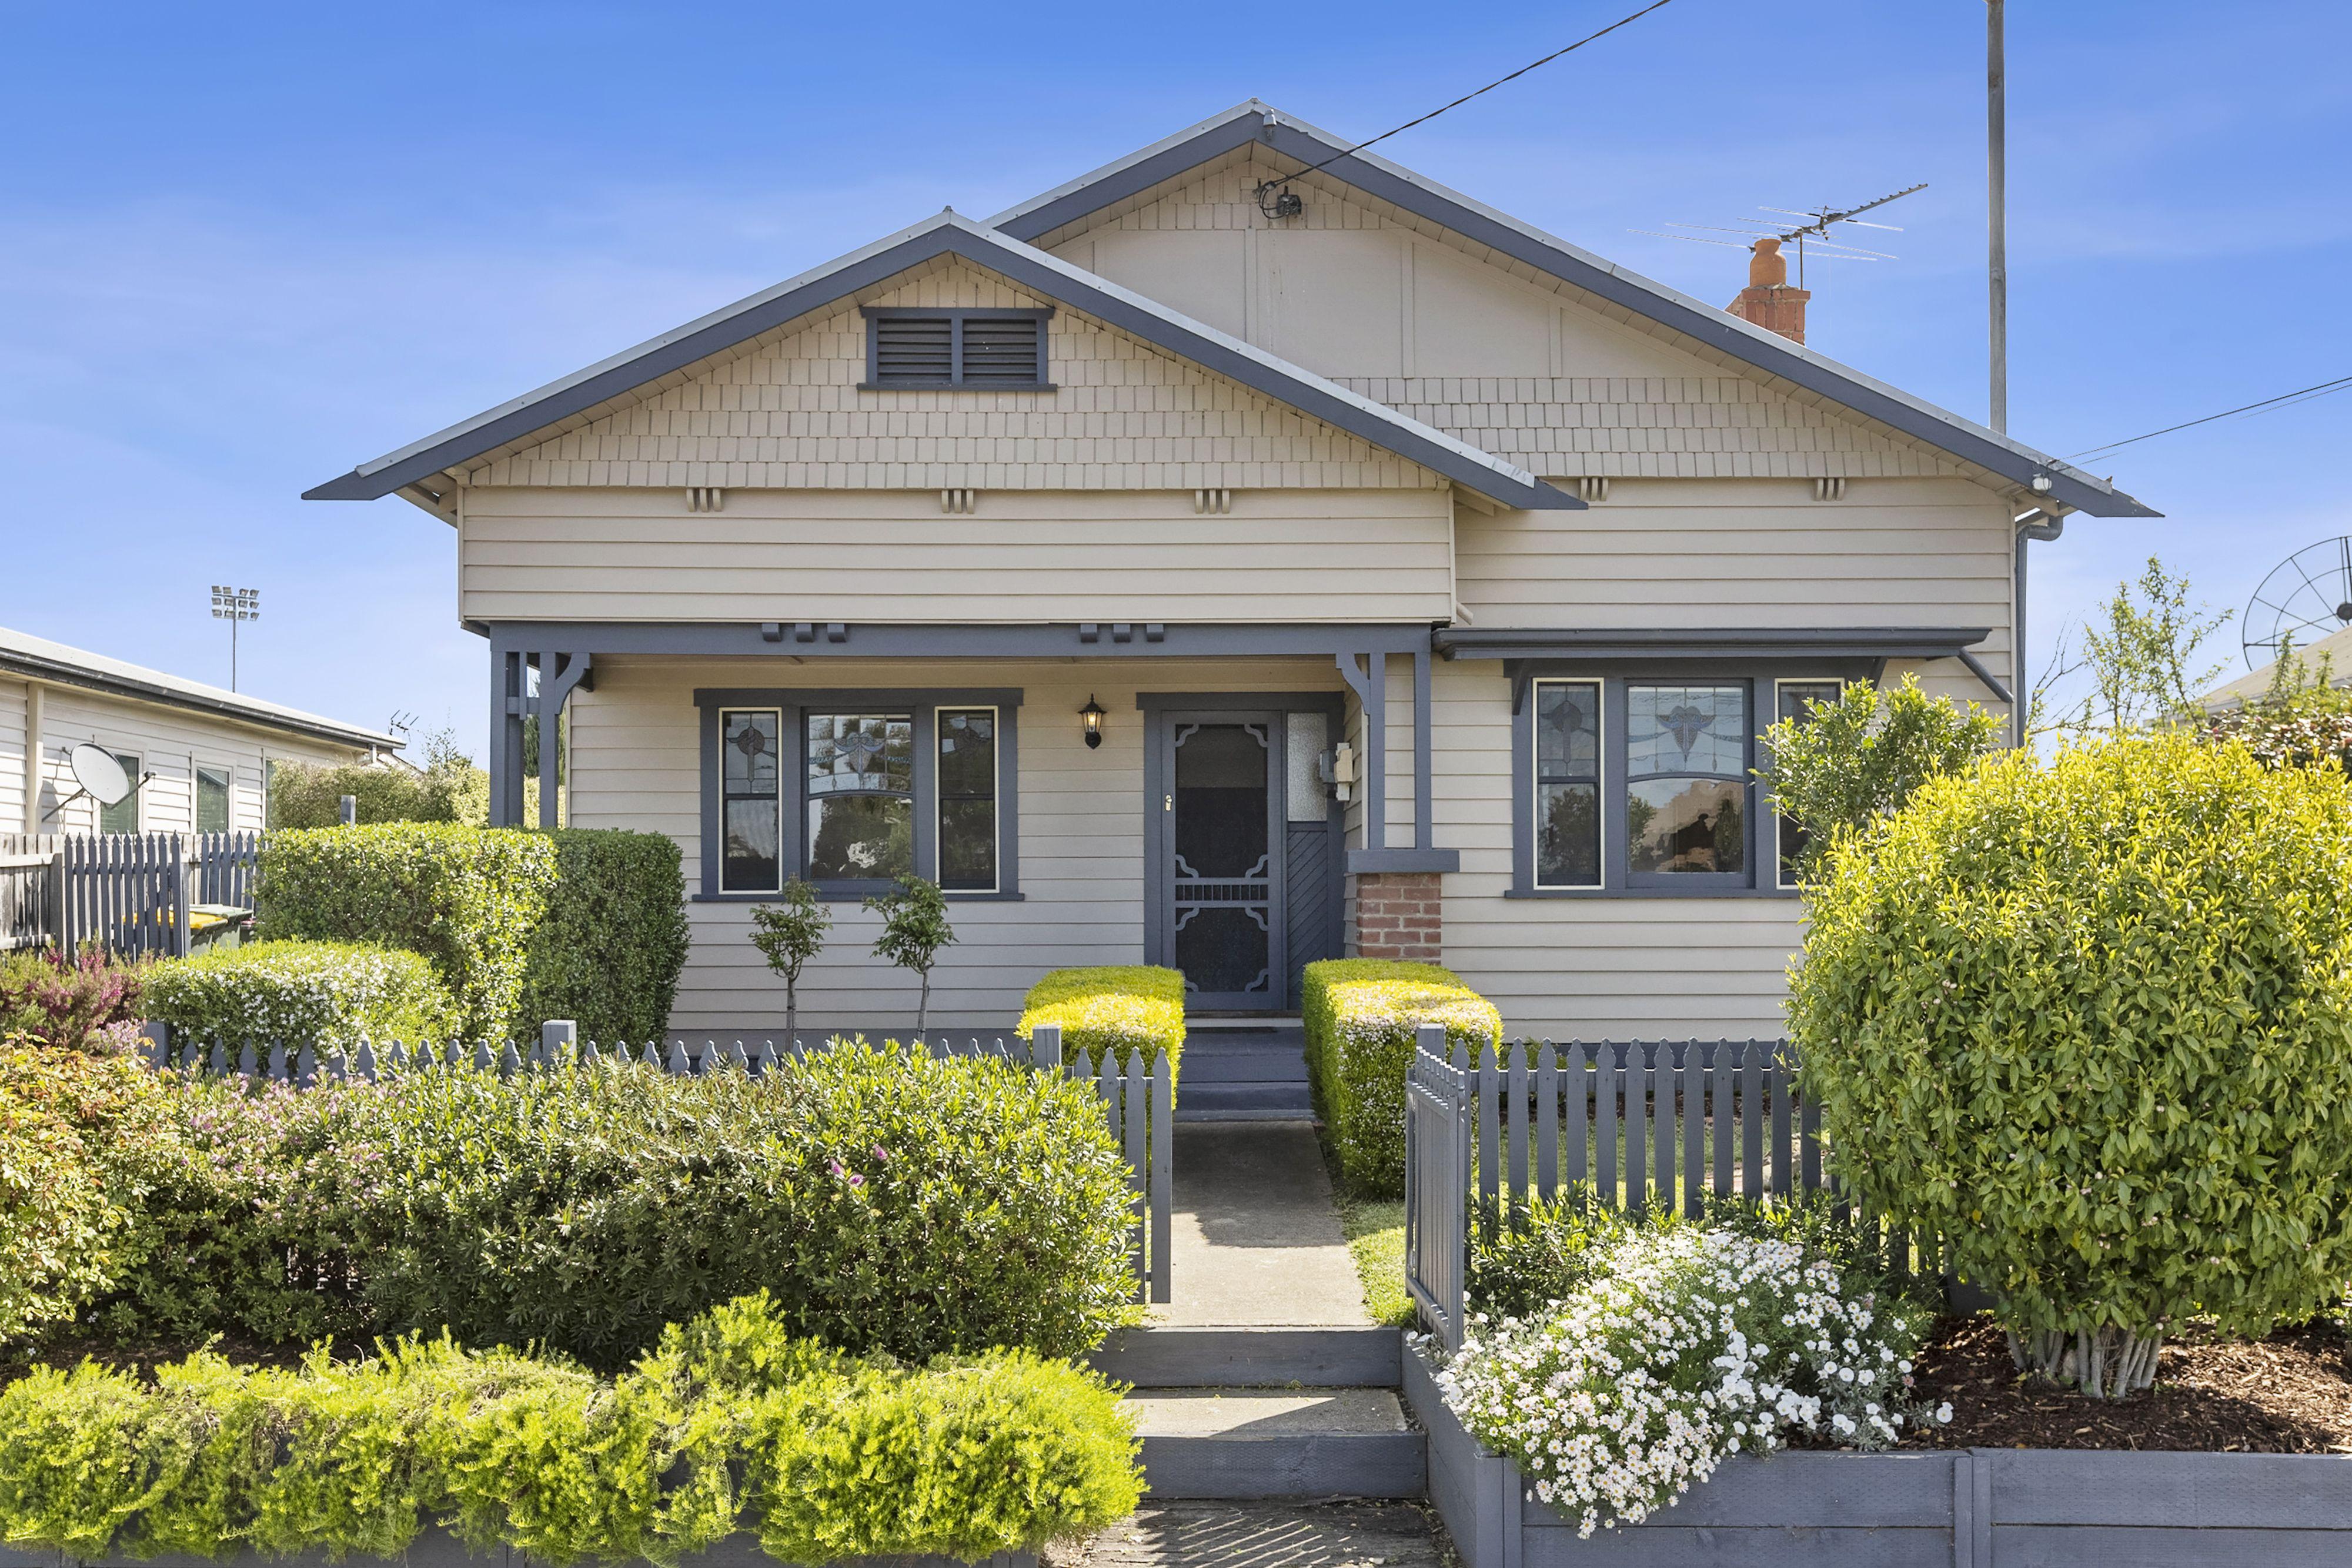 21 Craddock Street</br>North Geelong